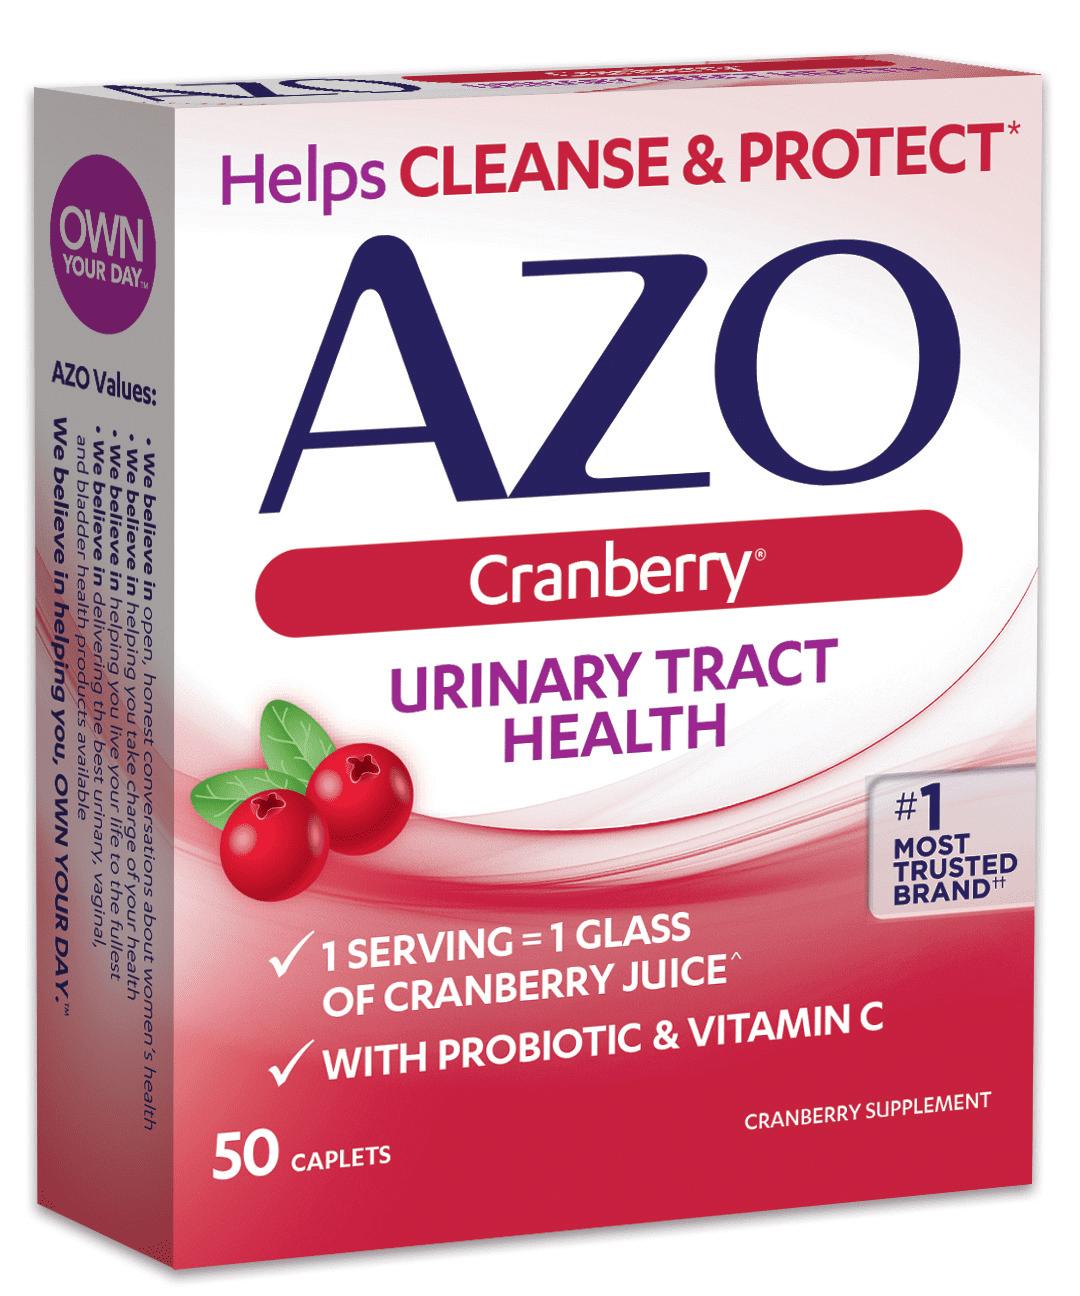 azo cranberry urinary tract health caplets, 50 ct - walmart